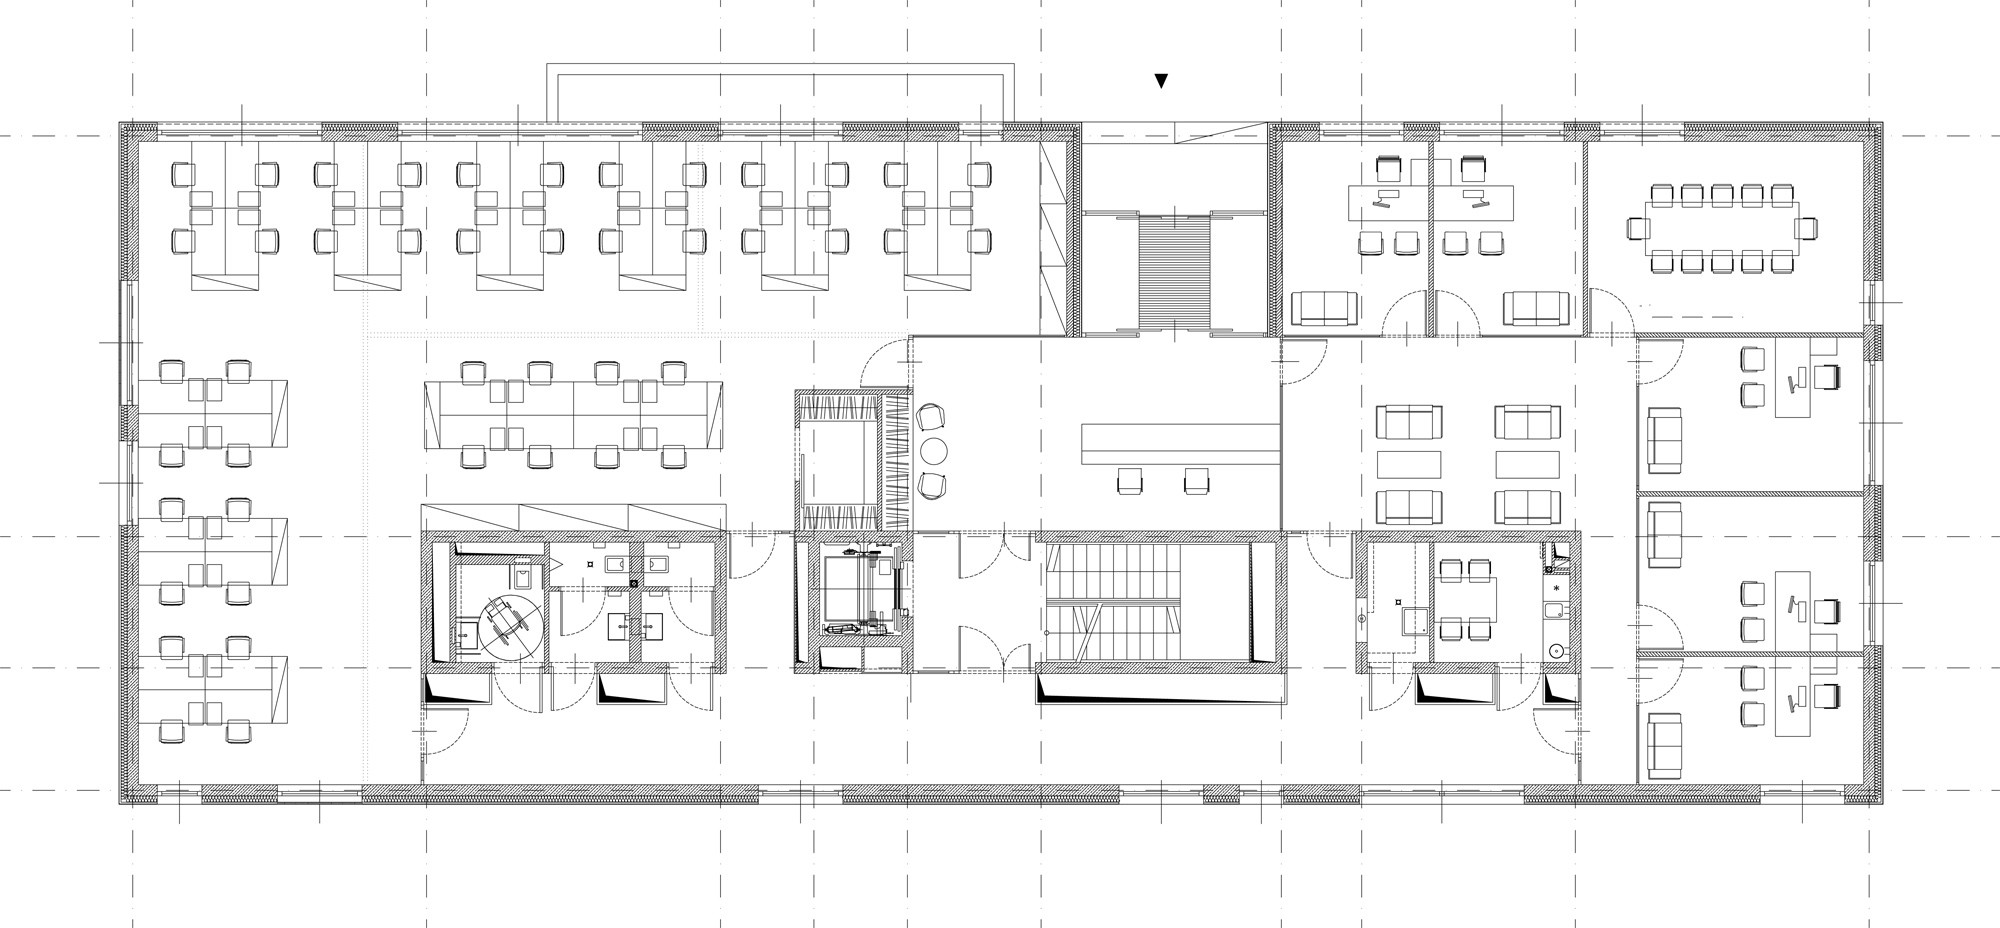 office building plans